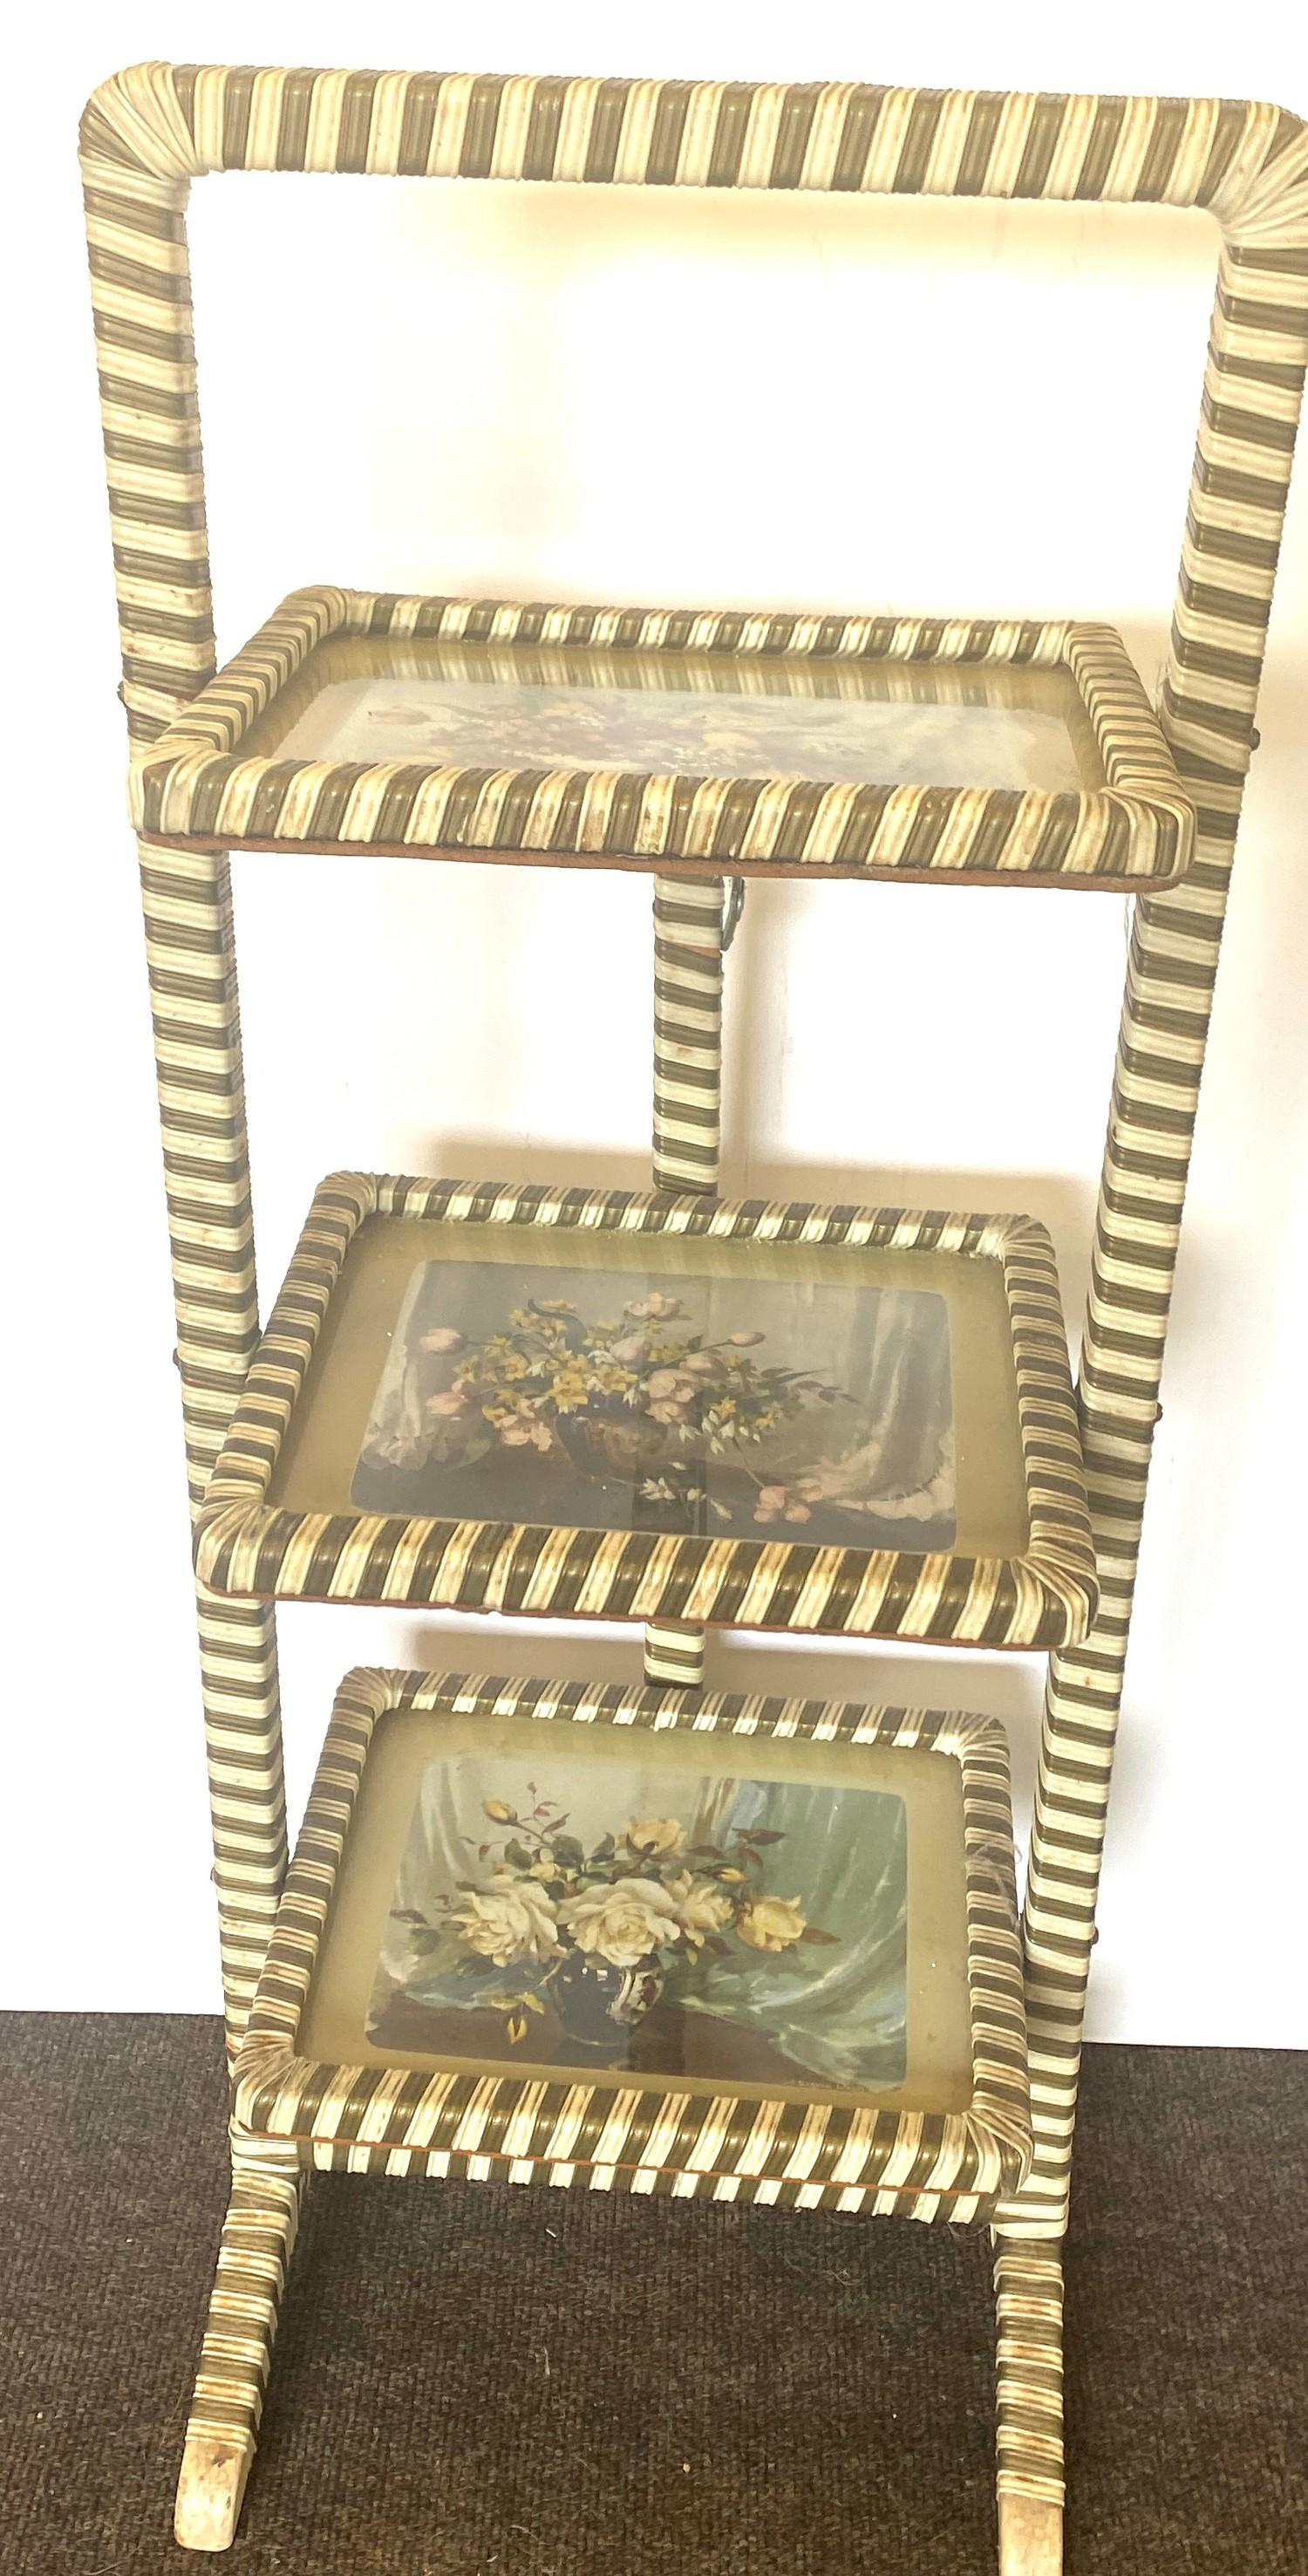 Retro cake stand - Image 2 of 2